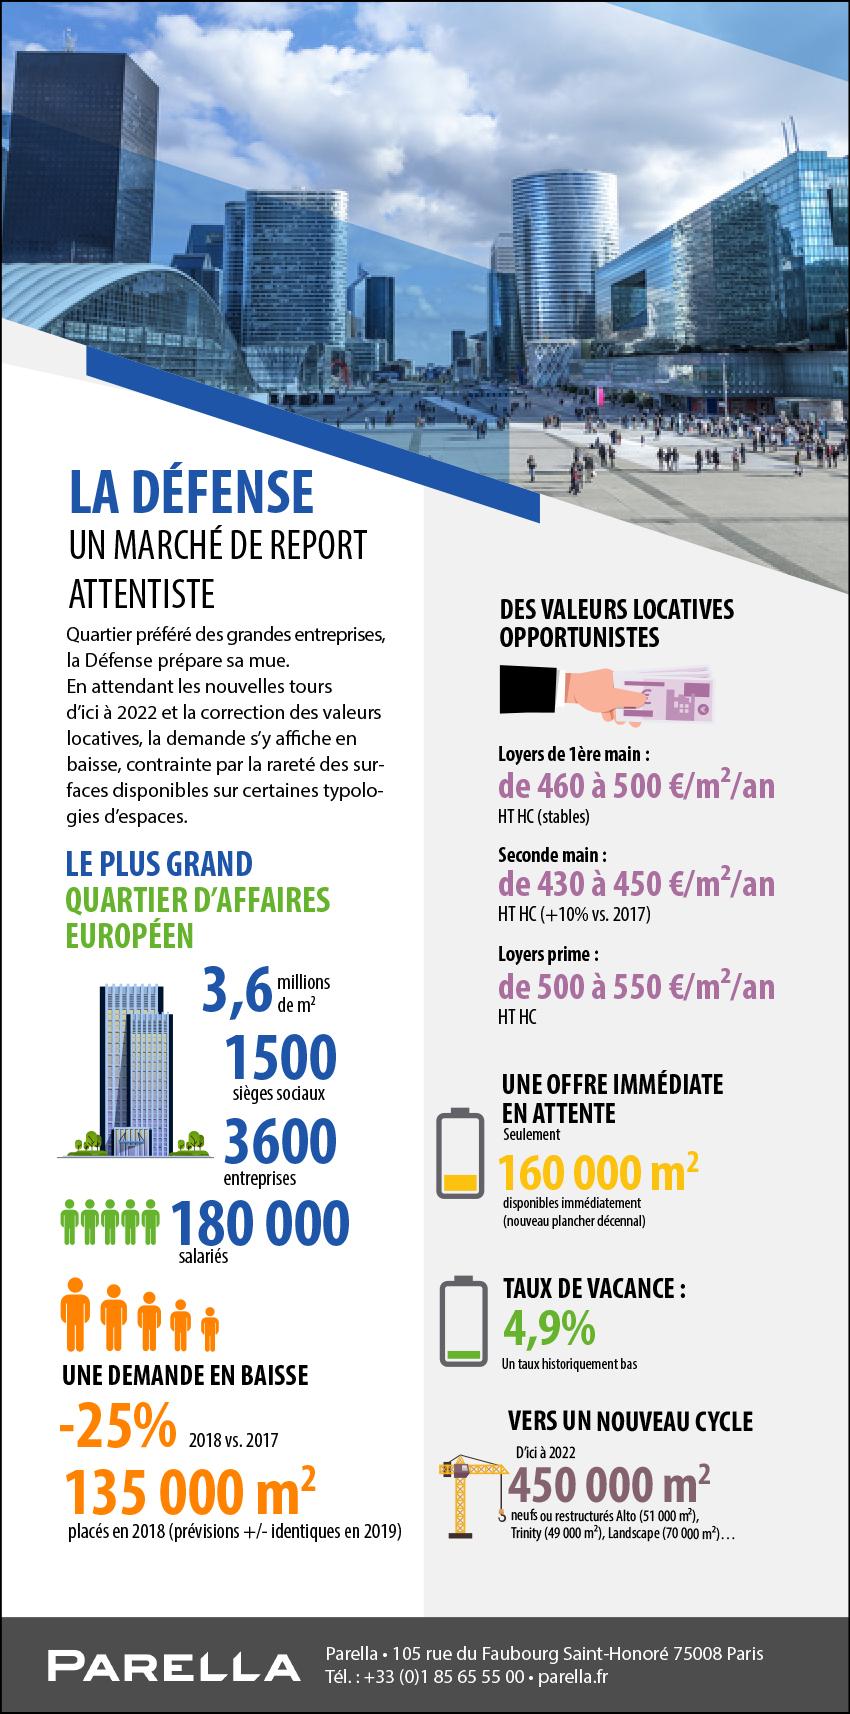 Infographie-Parella_La-Defense-un-marche-de-report-attentiste_T3-2019